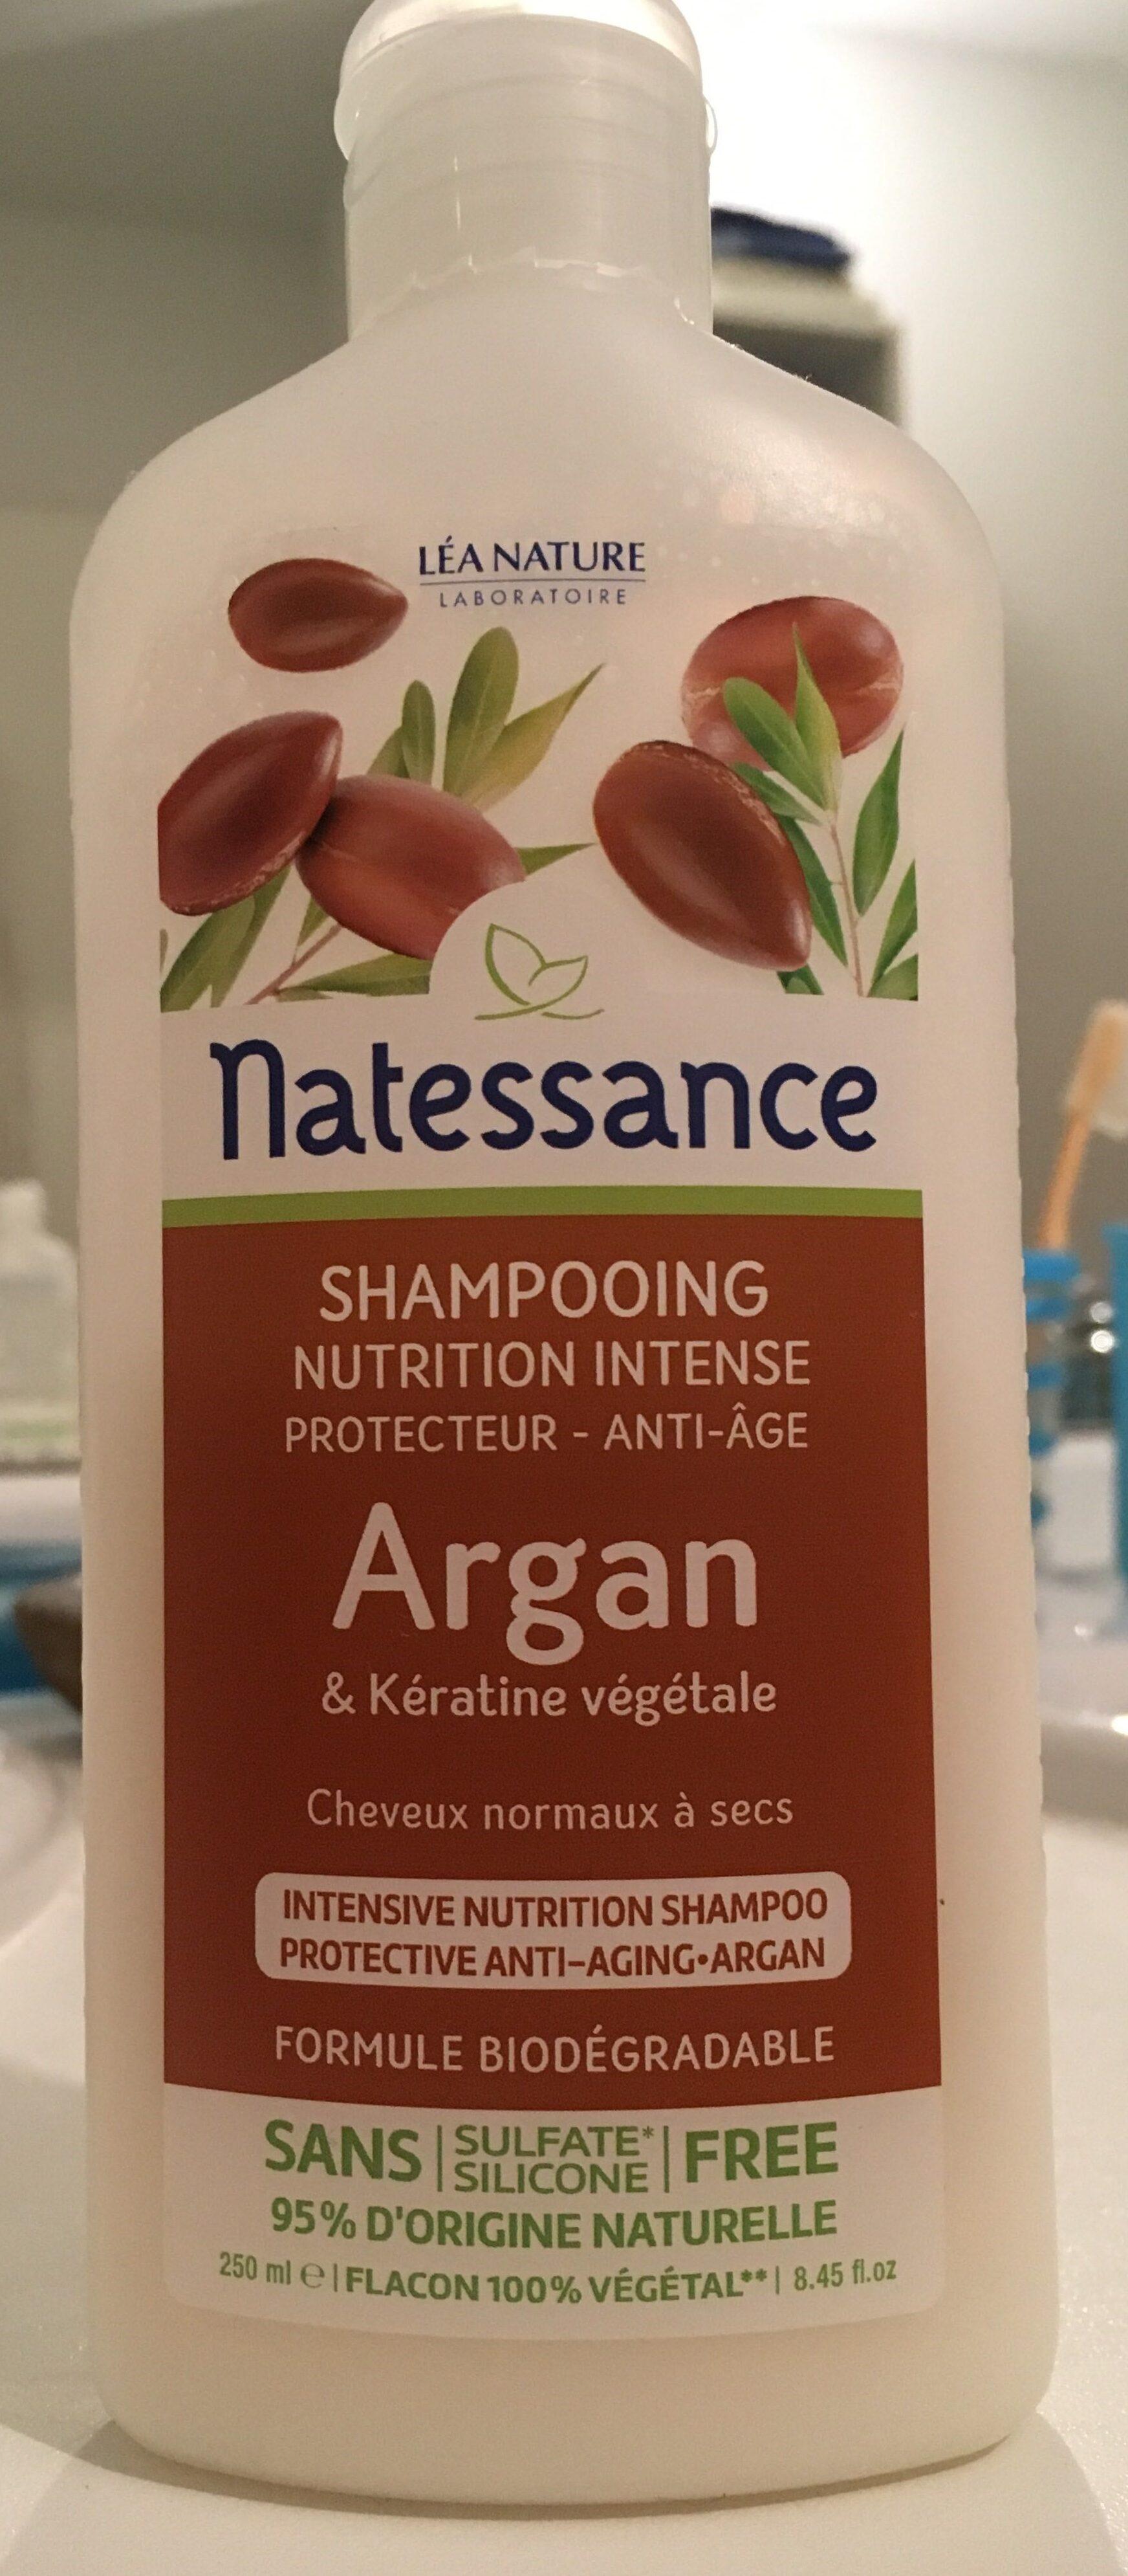 Shampooing nutrition intense argan & kératine végétale - Product - fr